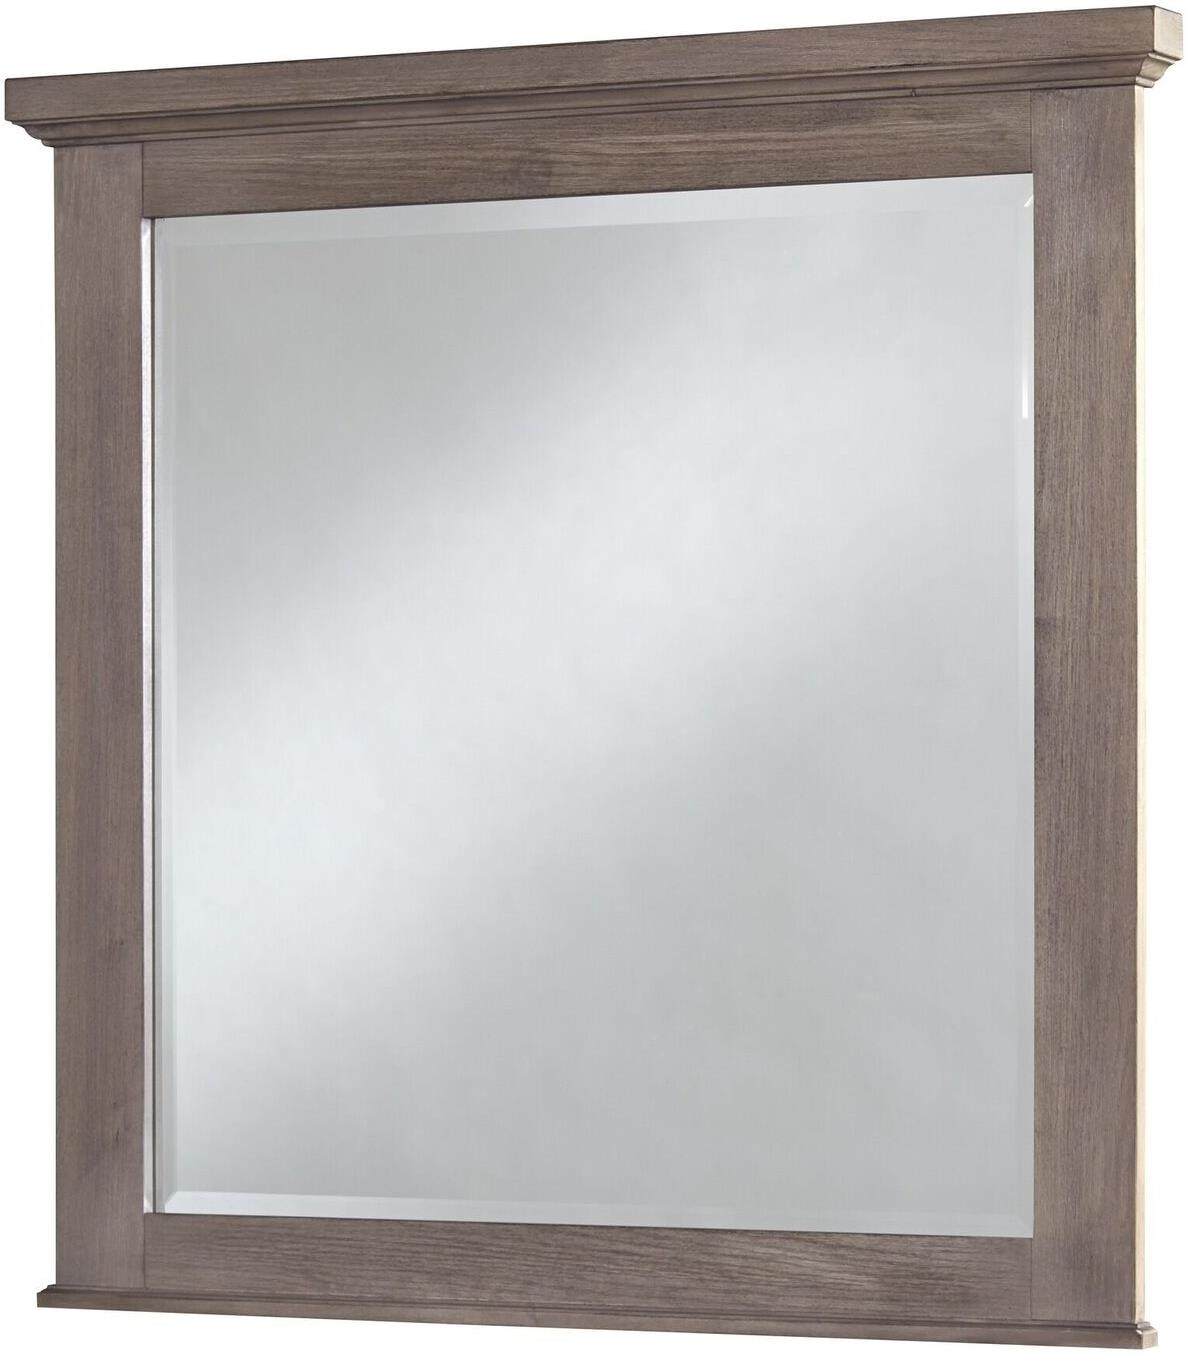 Vaughan Bassett Cassell Park Landscape Mirror - Item Number: 516-446